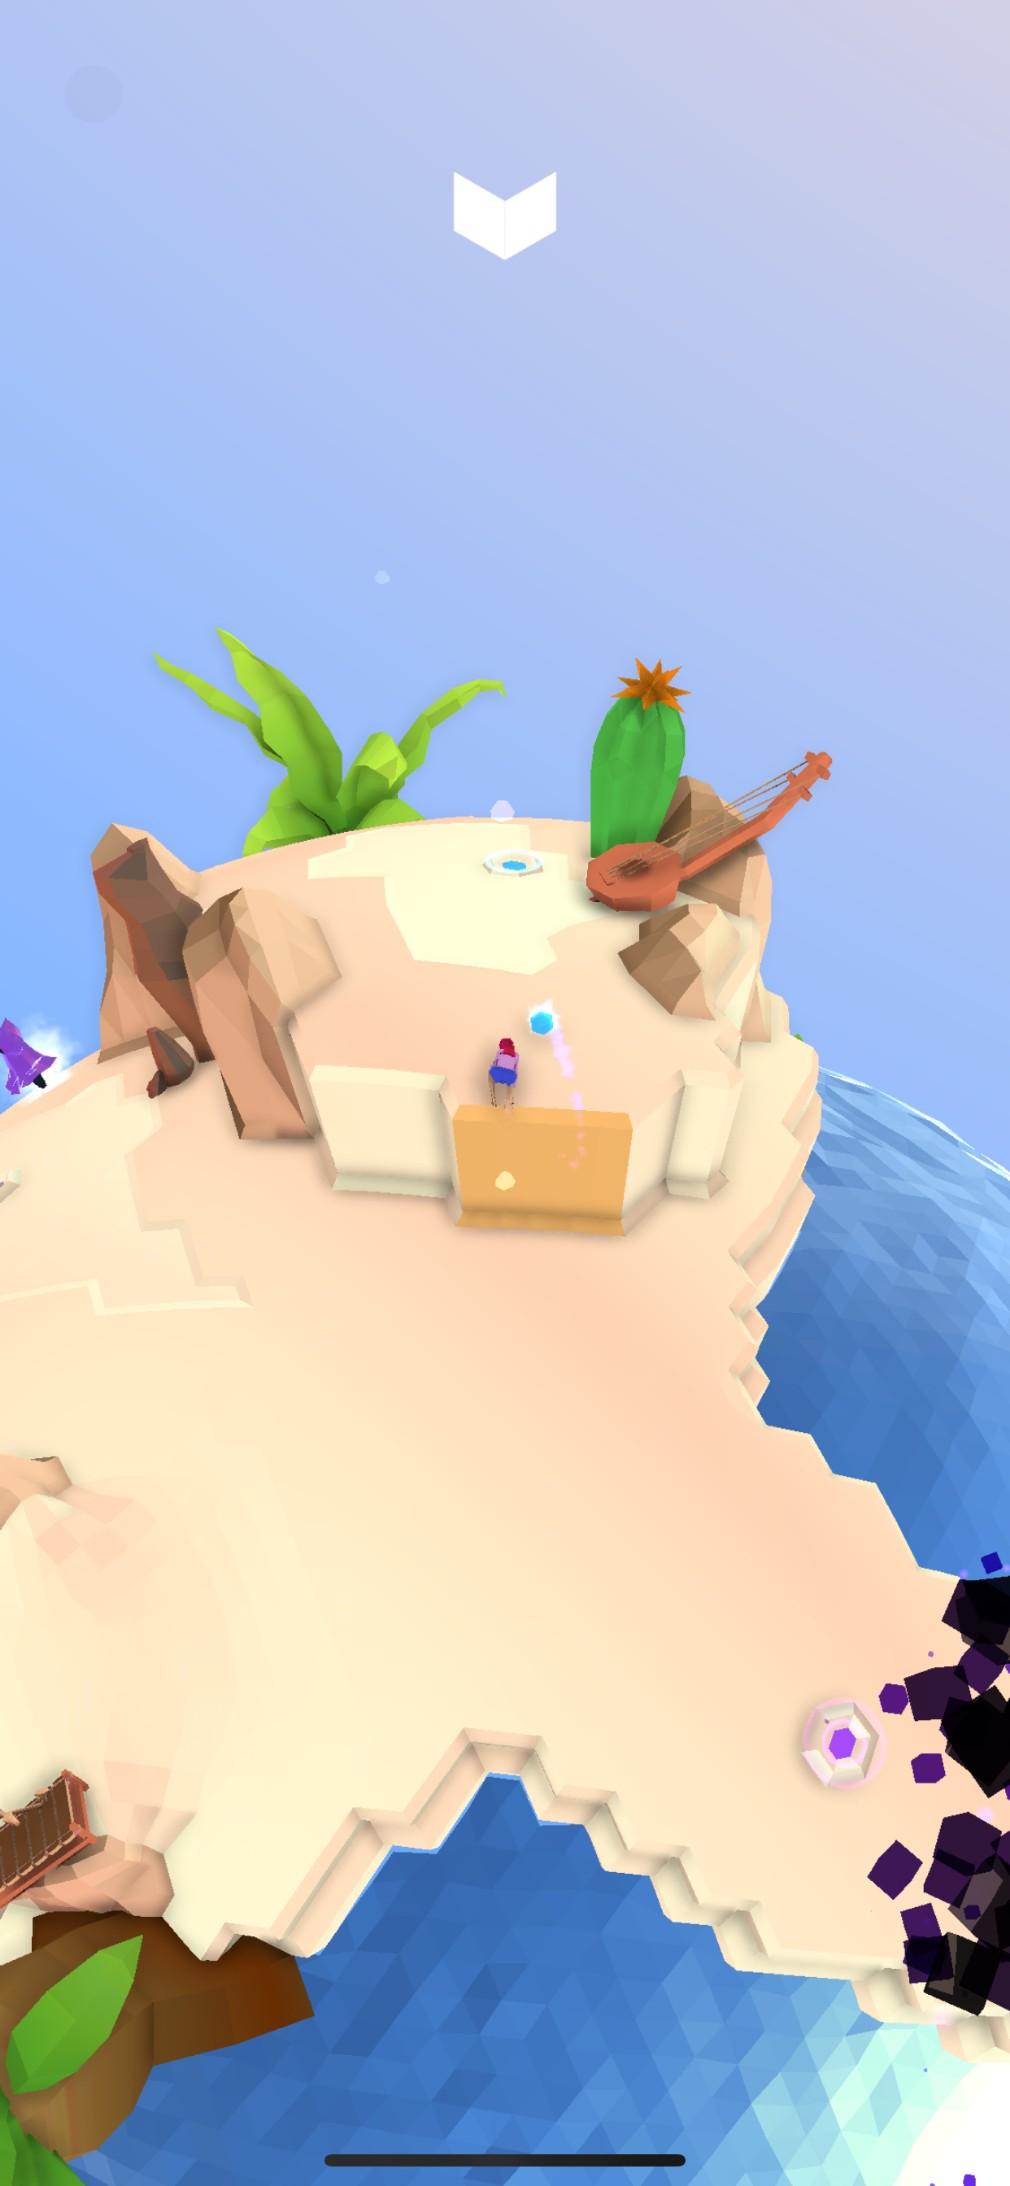 Apollo: A Dream Odyssey iOS screenshot - Solving a puzzle near the beach